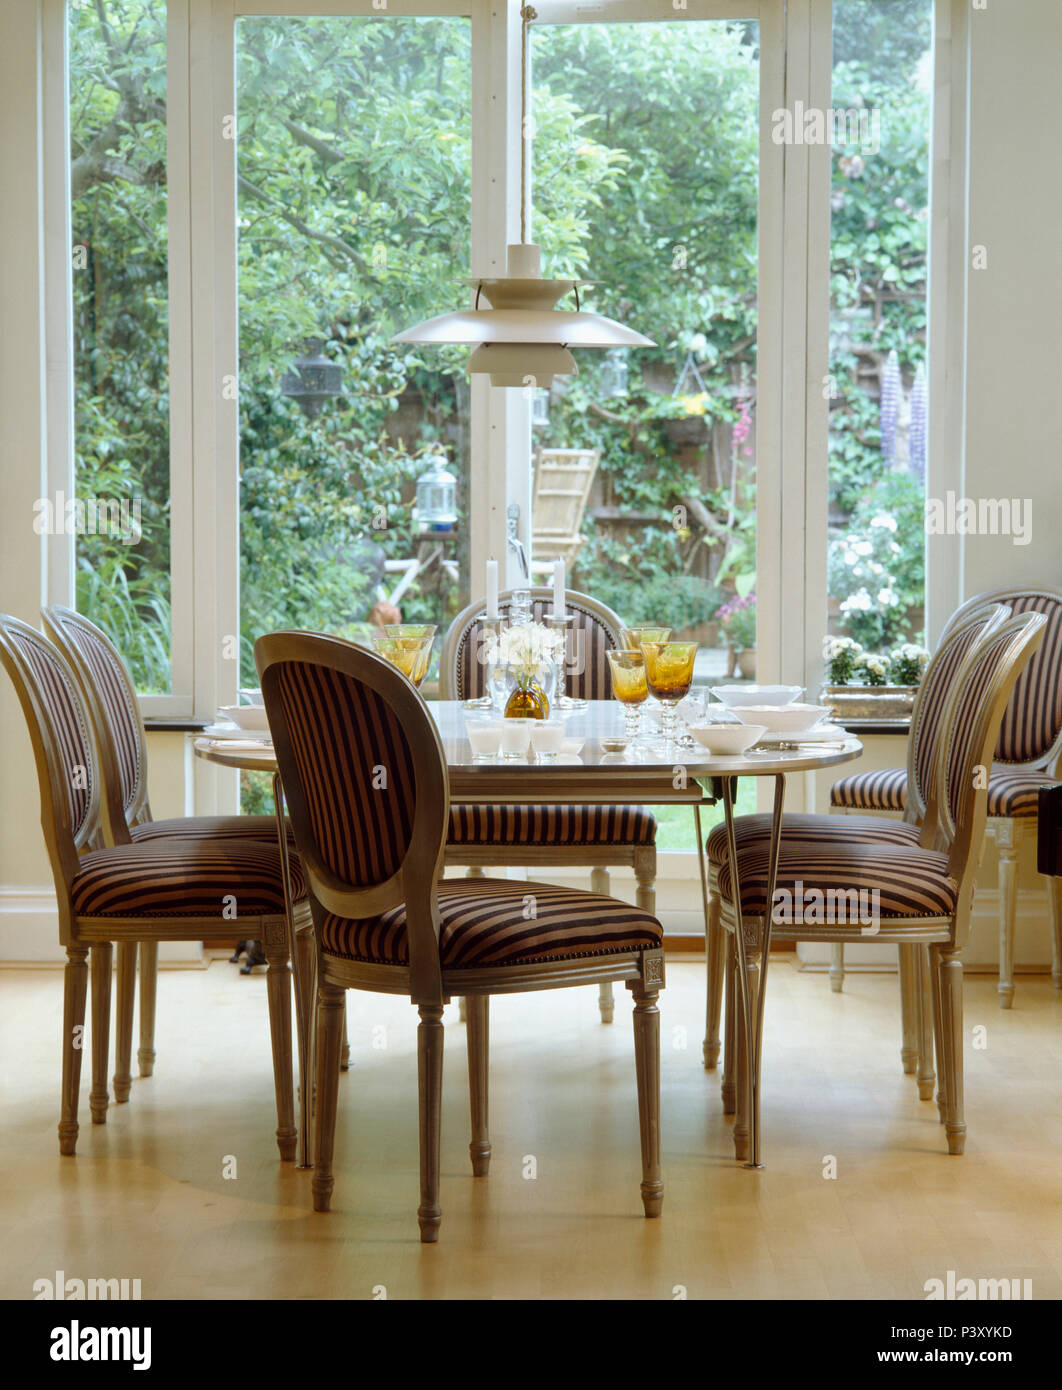 Sedie Imbottite Per Sala Da Pranzo.Striped Sedie Imbottite Di Fronte A Finestre Alte In Elegante